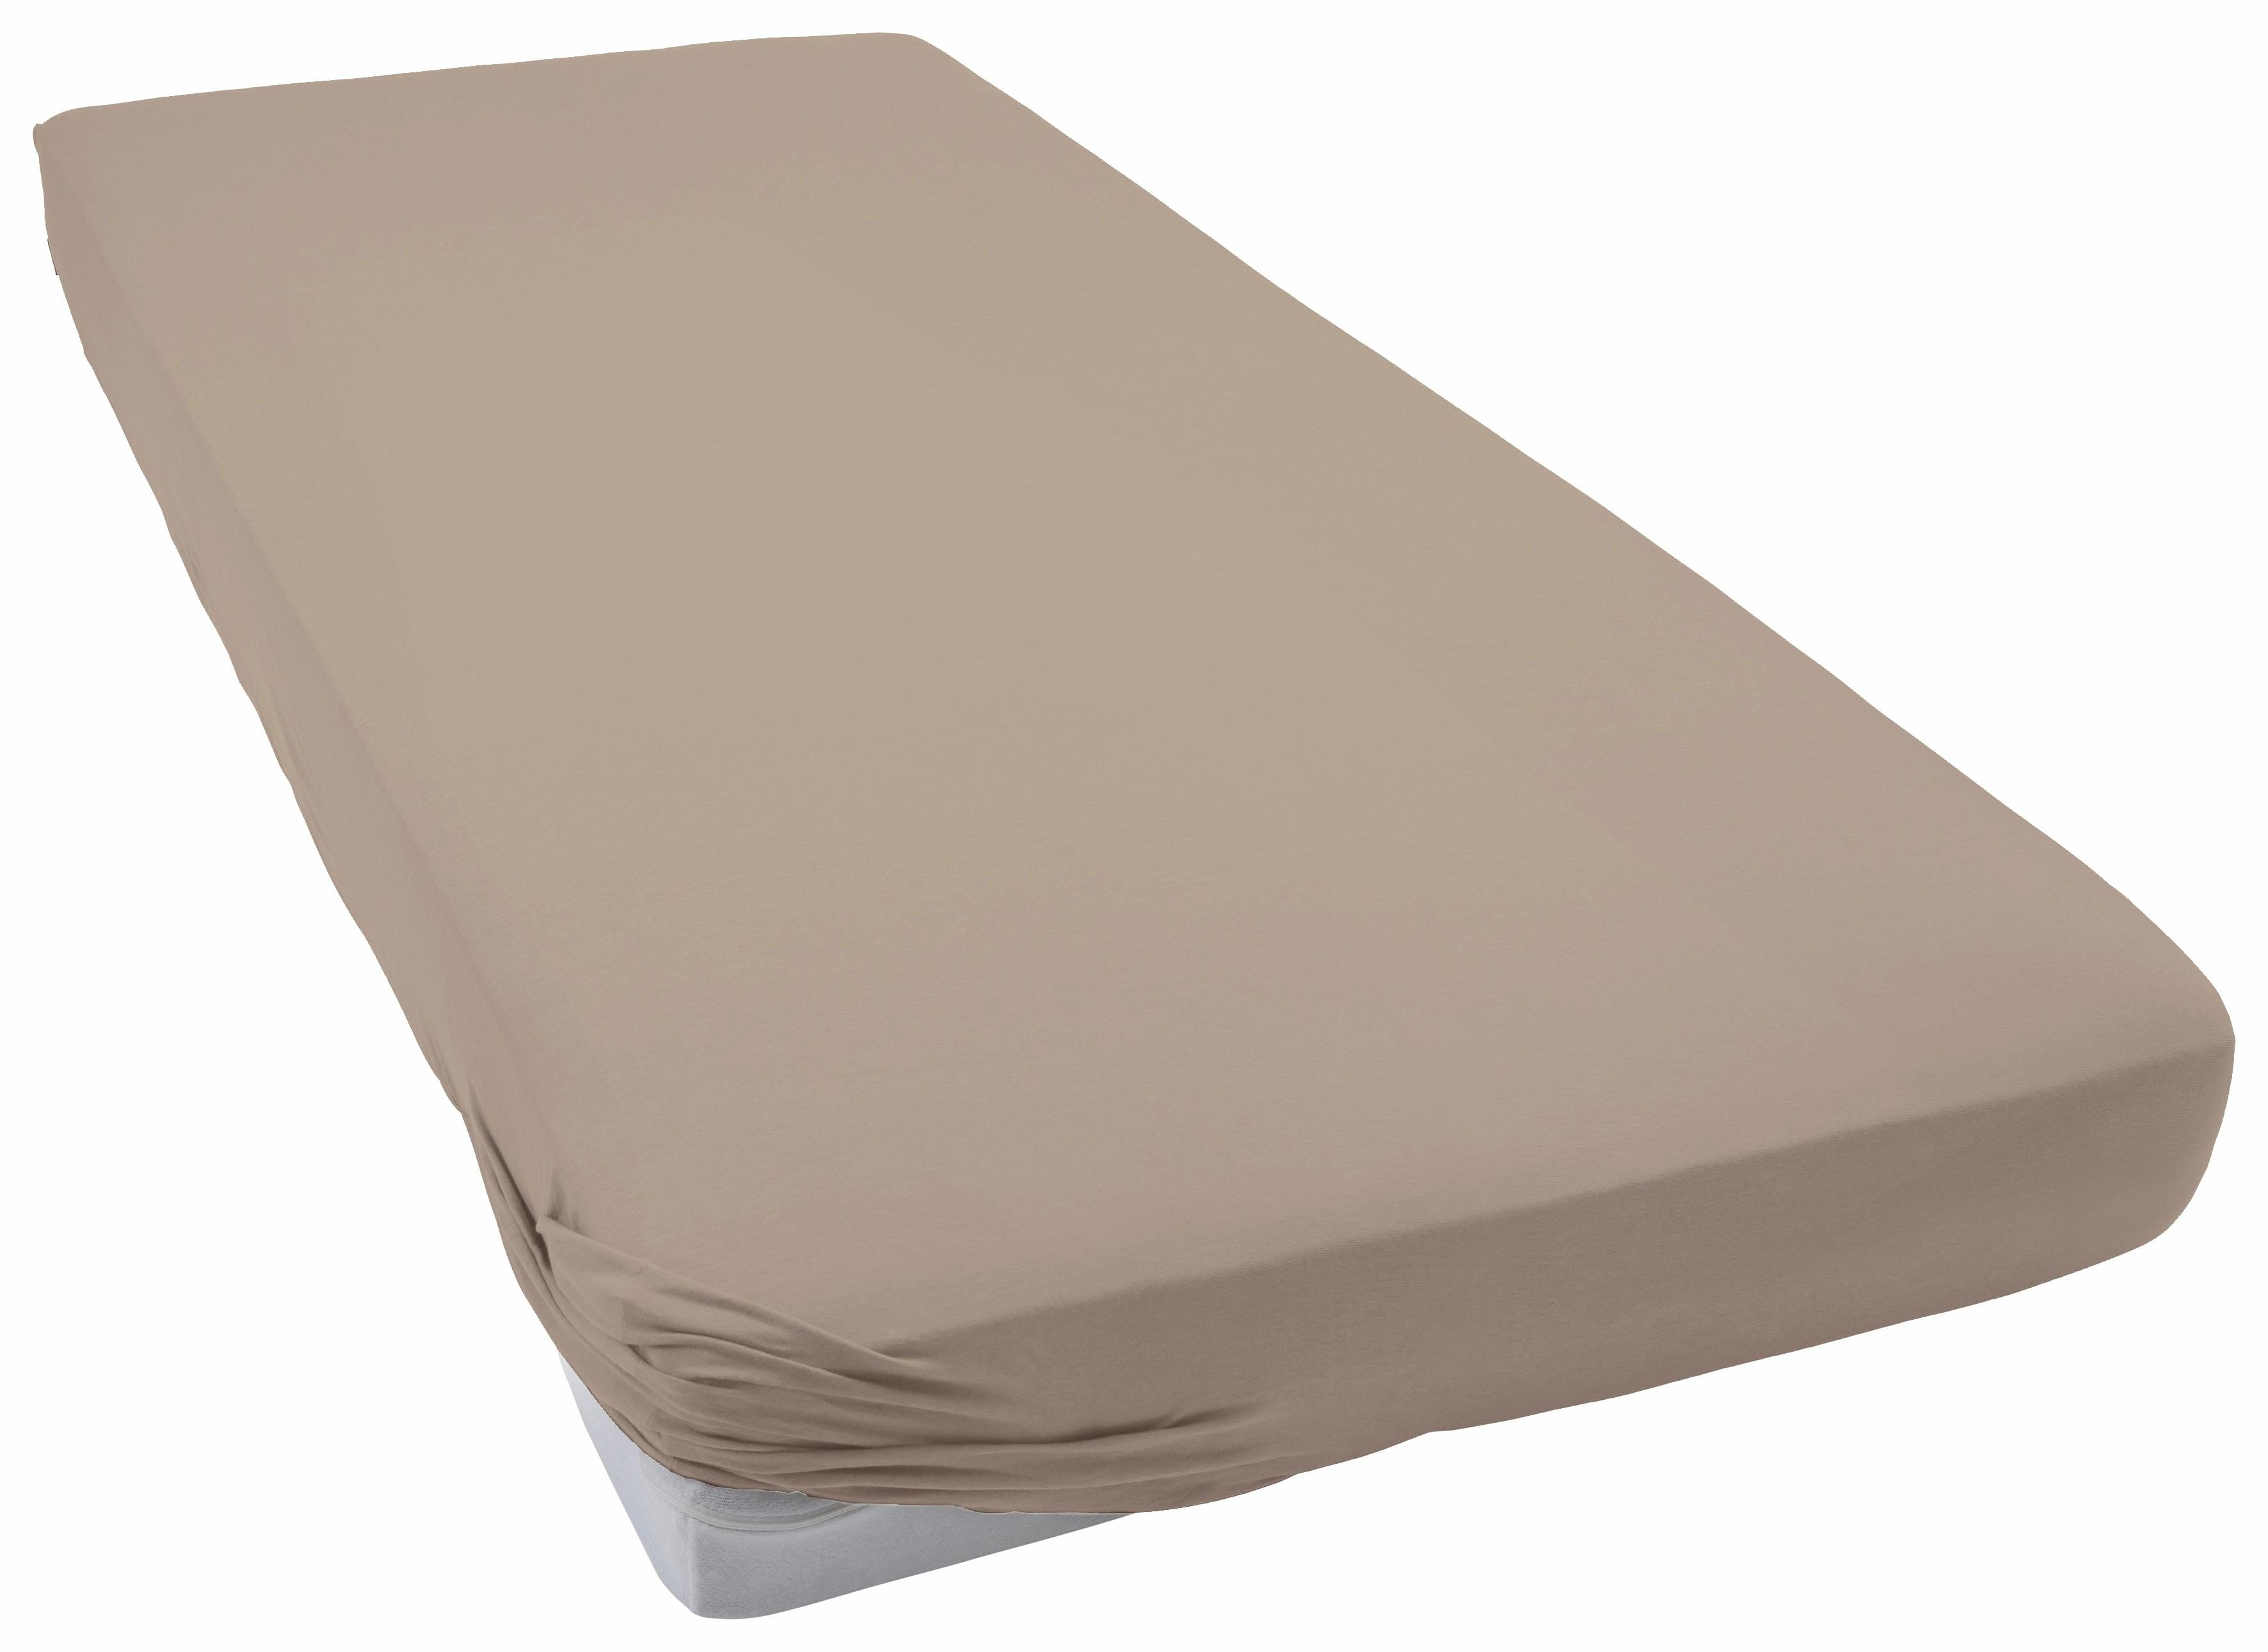 Spannbettlaken Flausch-Jersey Schlafgut | Heimtextilien > Bettwäsche und Laken > Bettlaken | Braun | Baumwolle | Schlafgut